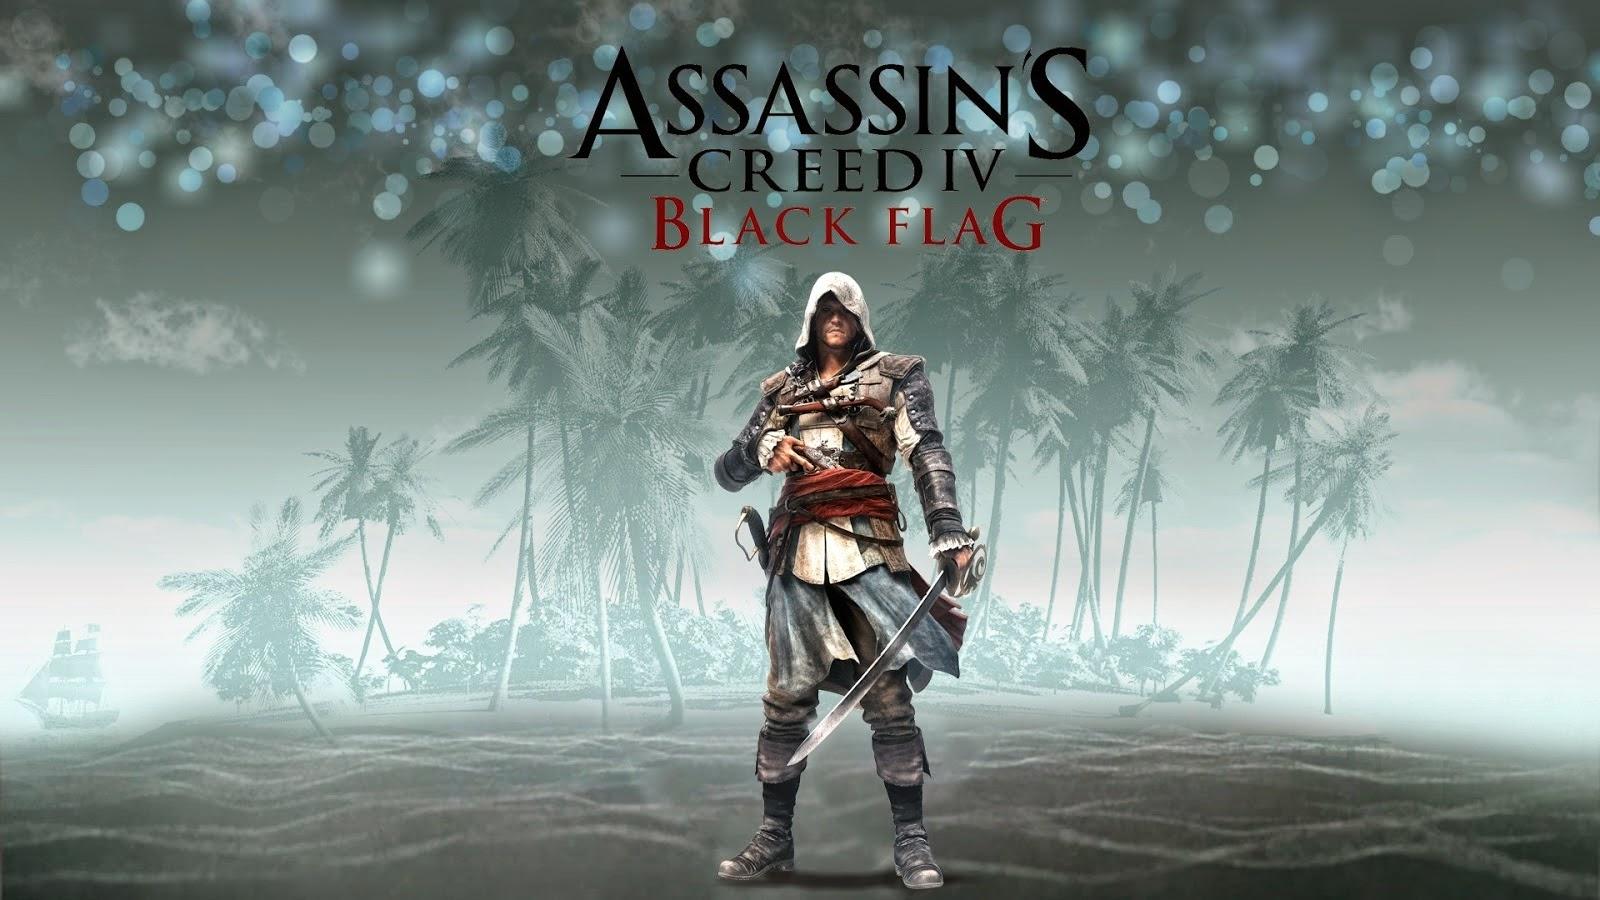 assassins creed black flag pc download utorrent